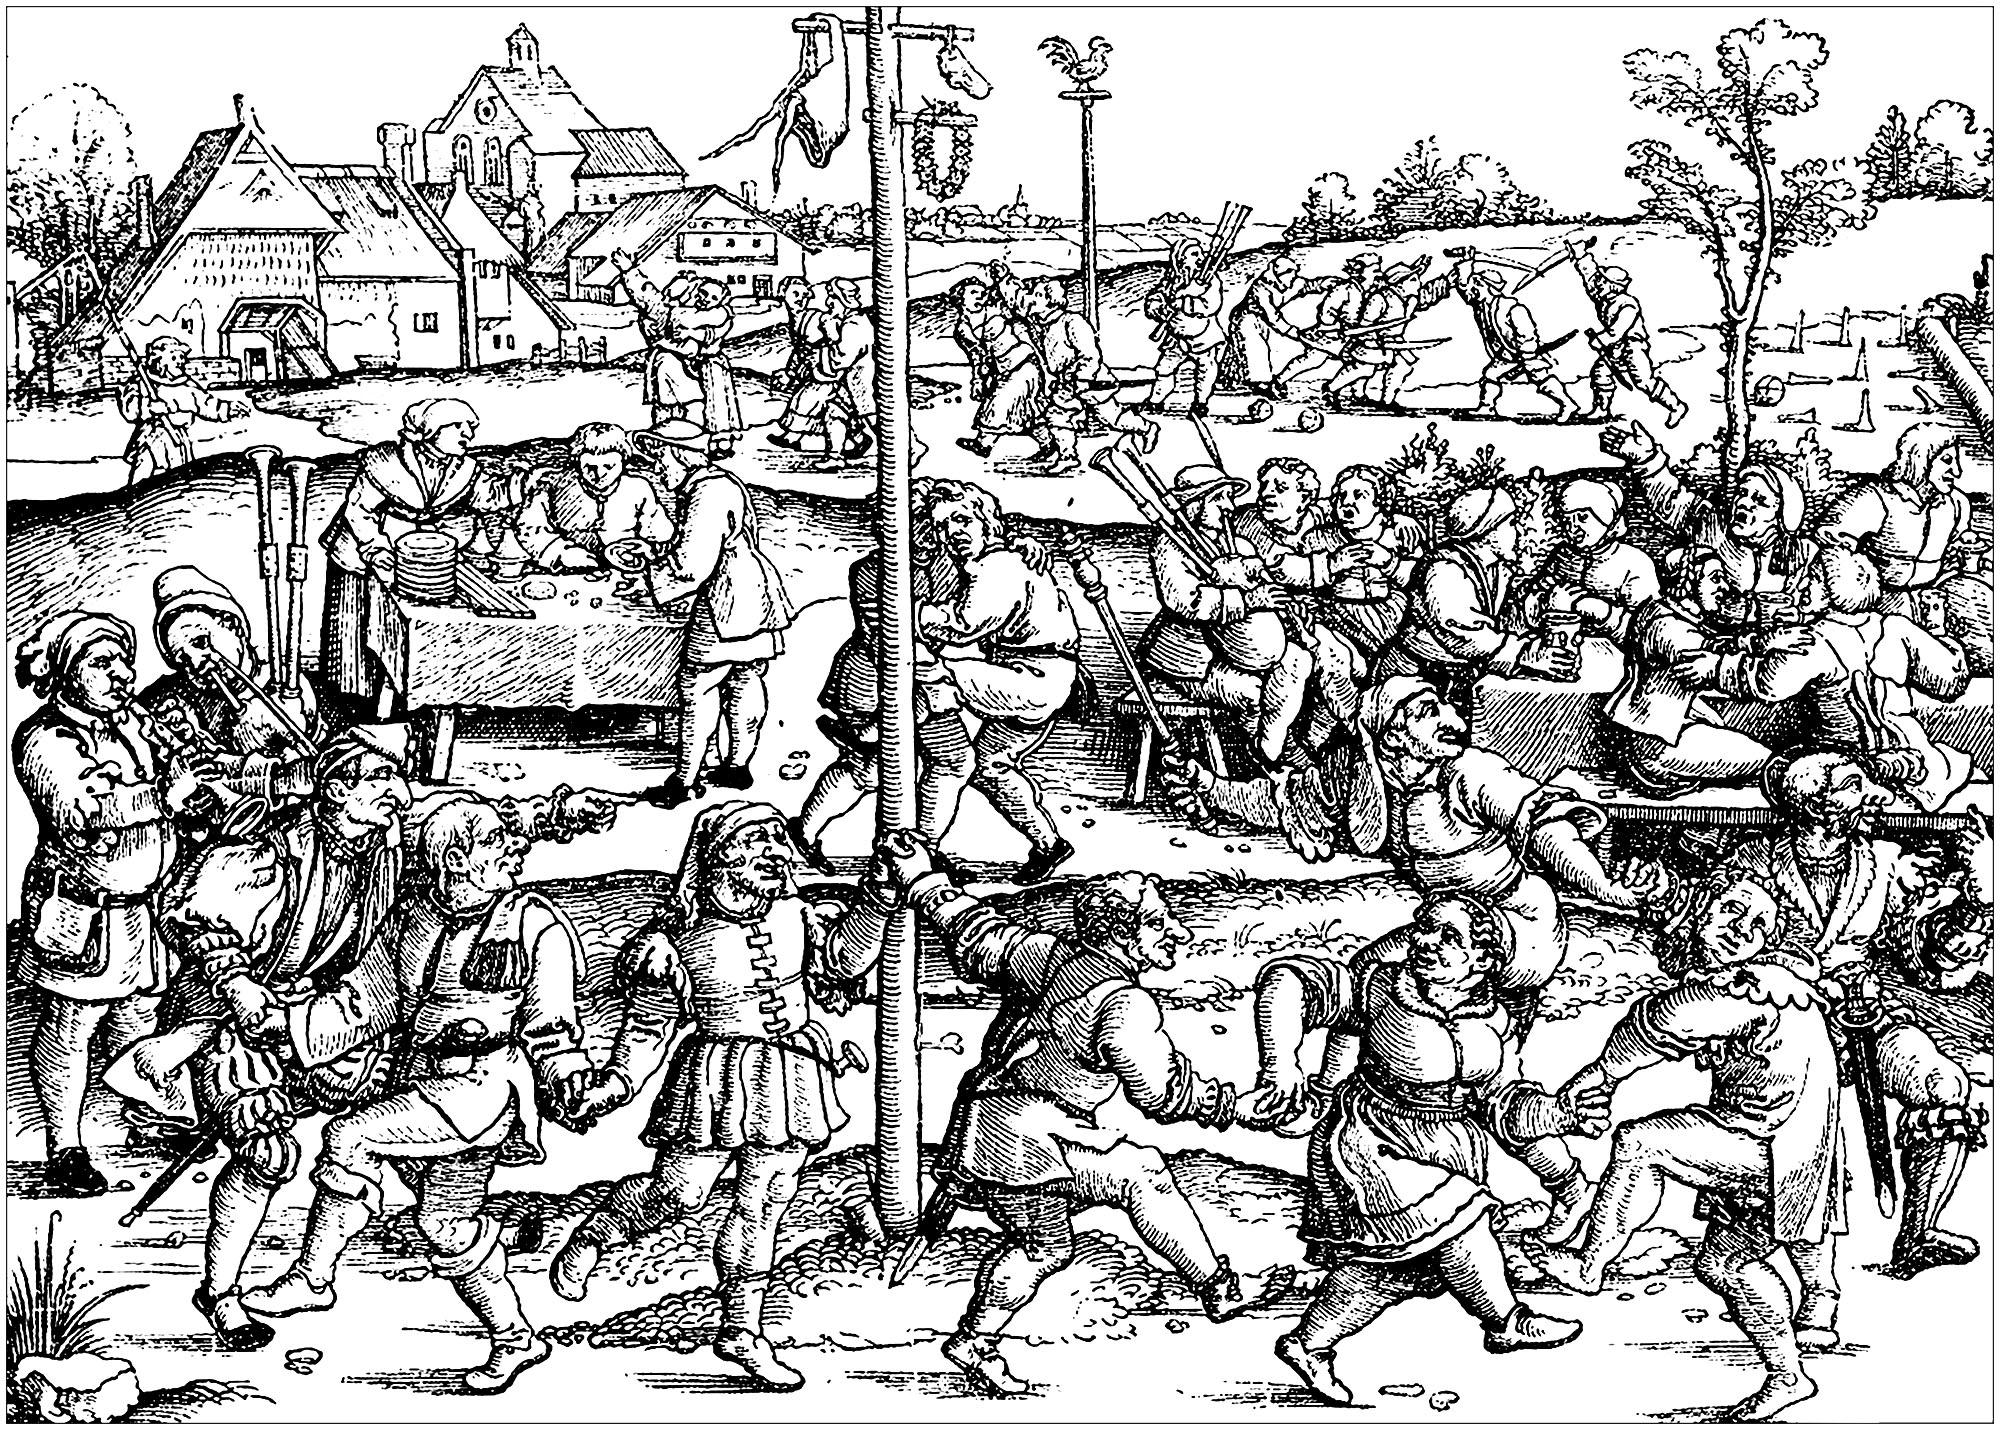 Malbuch Fur Erwachsene  : Mittelalter - 2